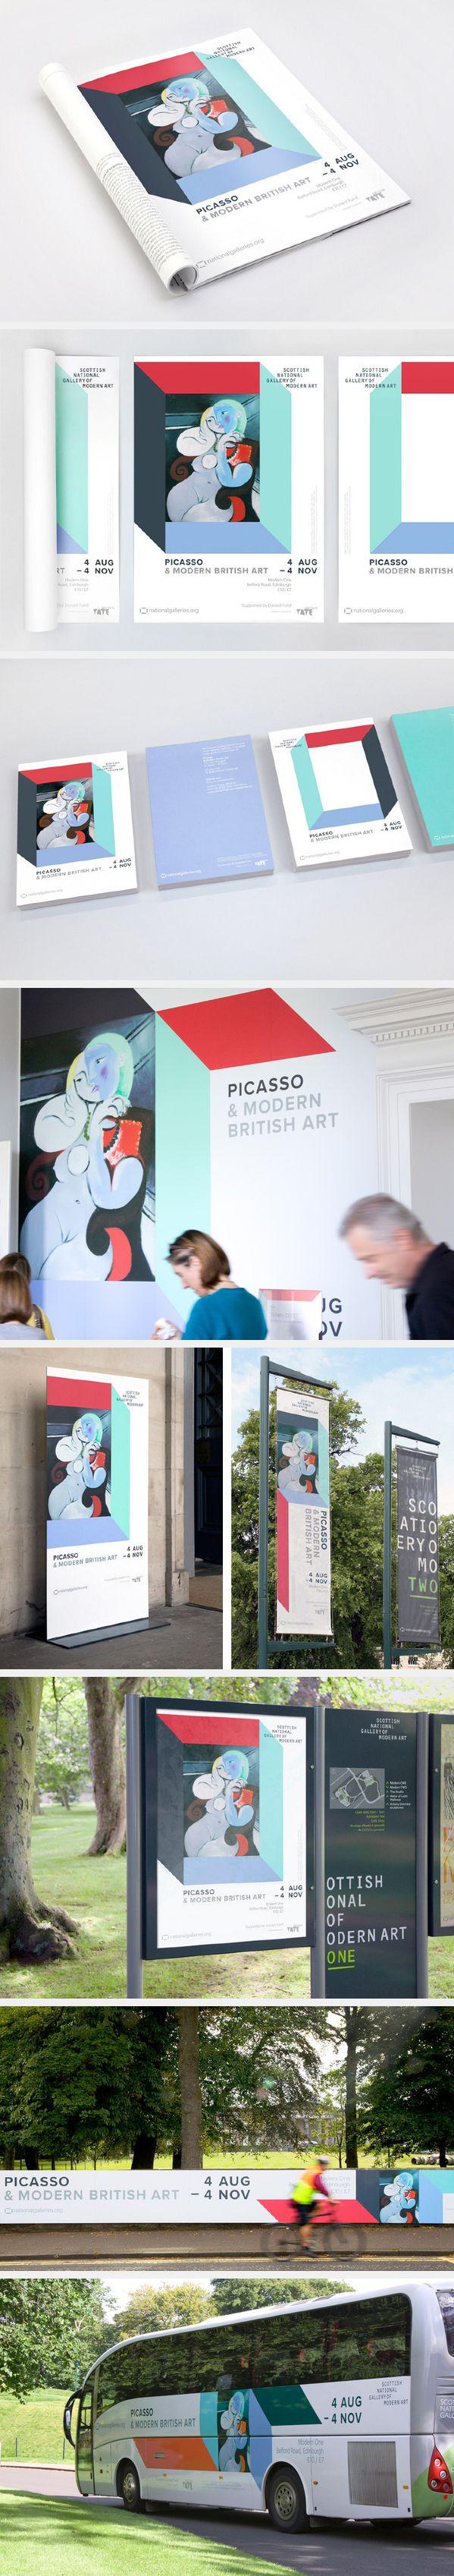 Picasso & Modern British Art by Greig Anderson